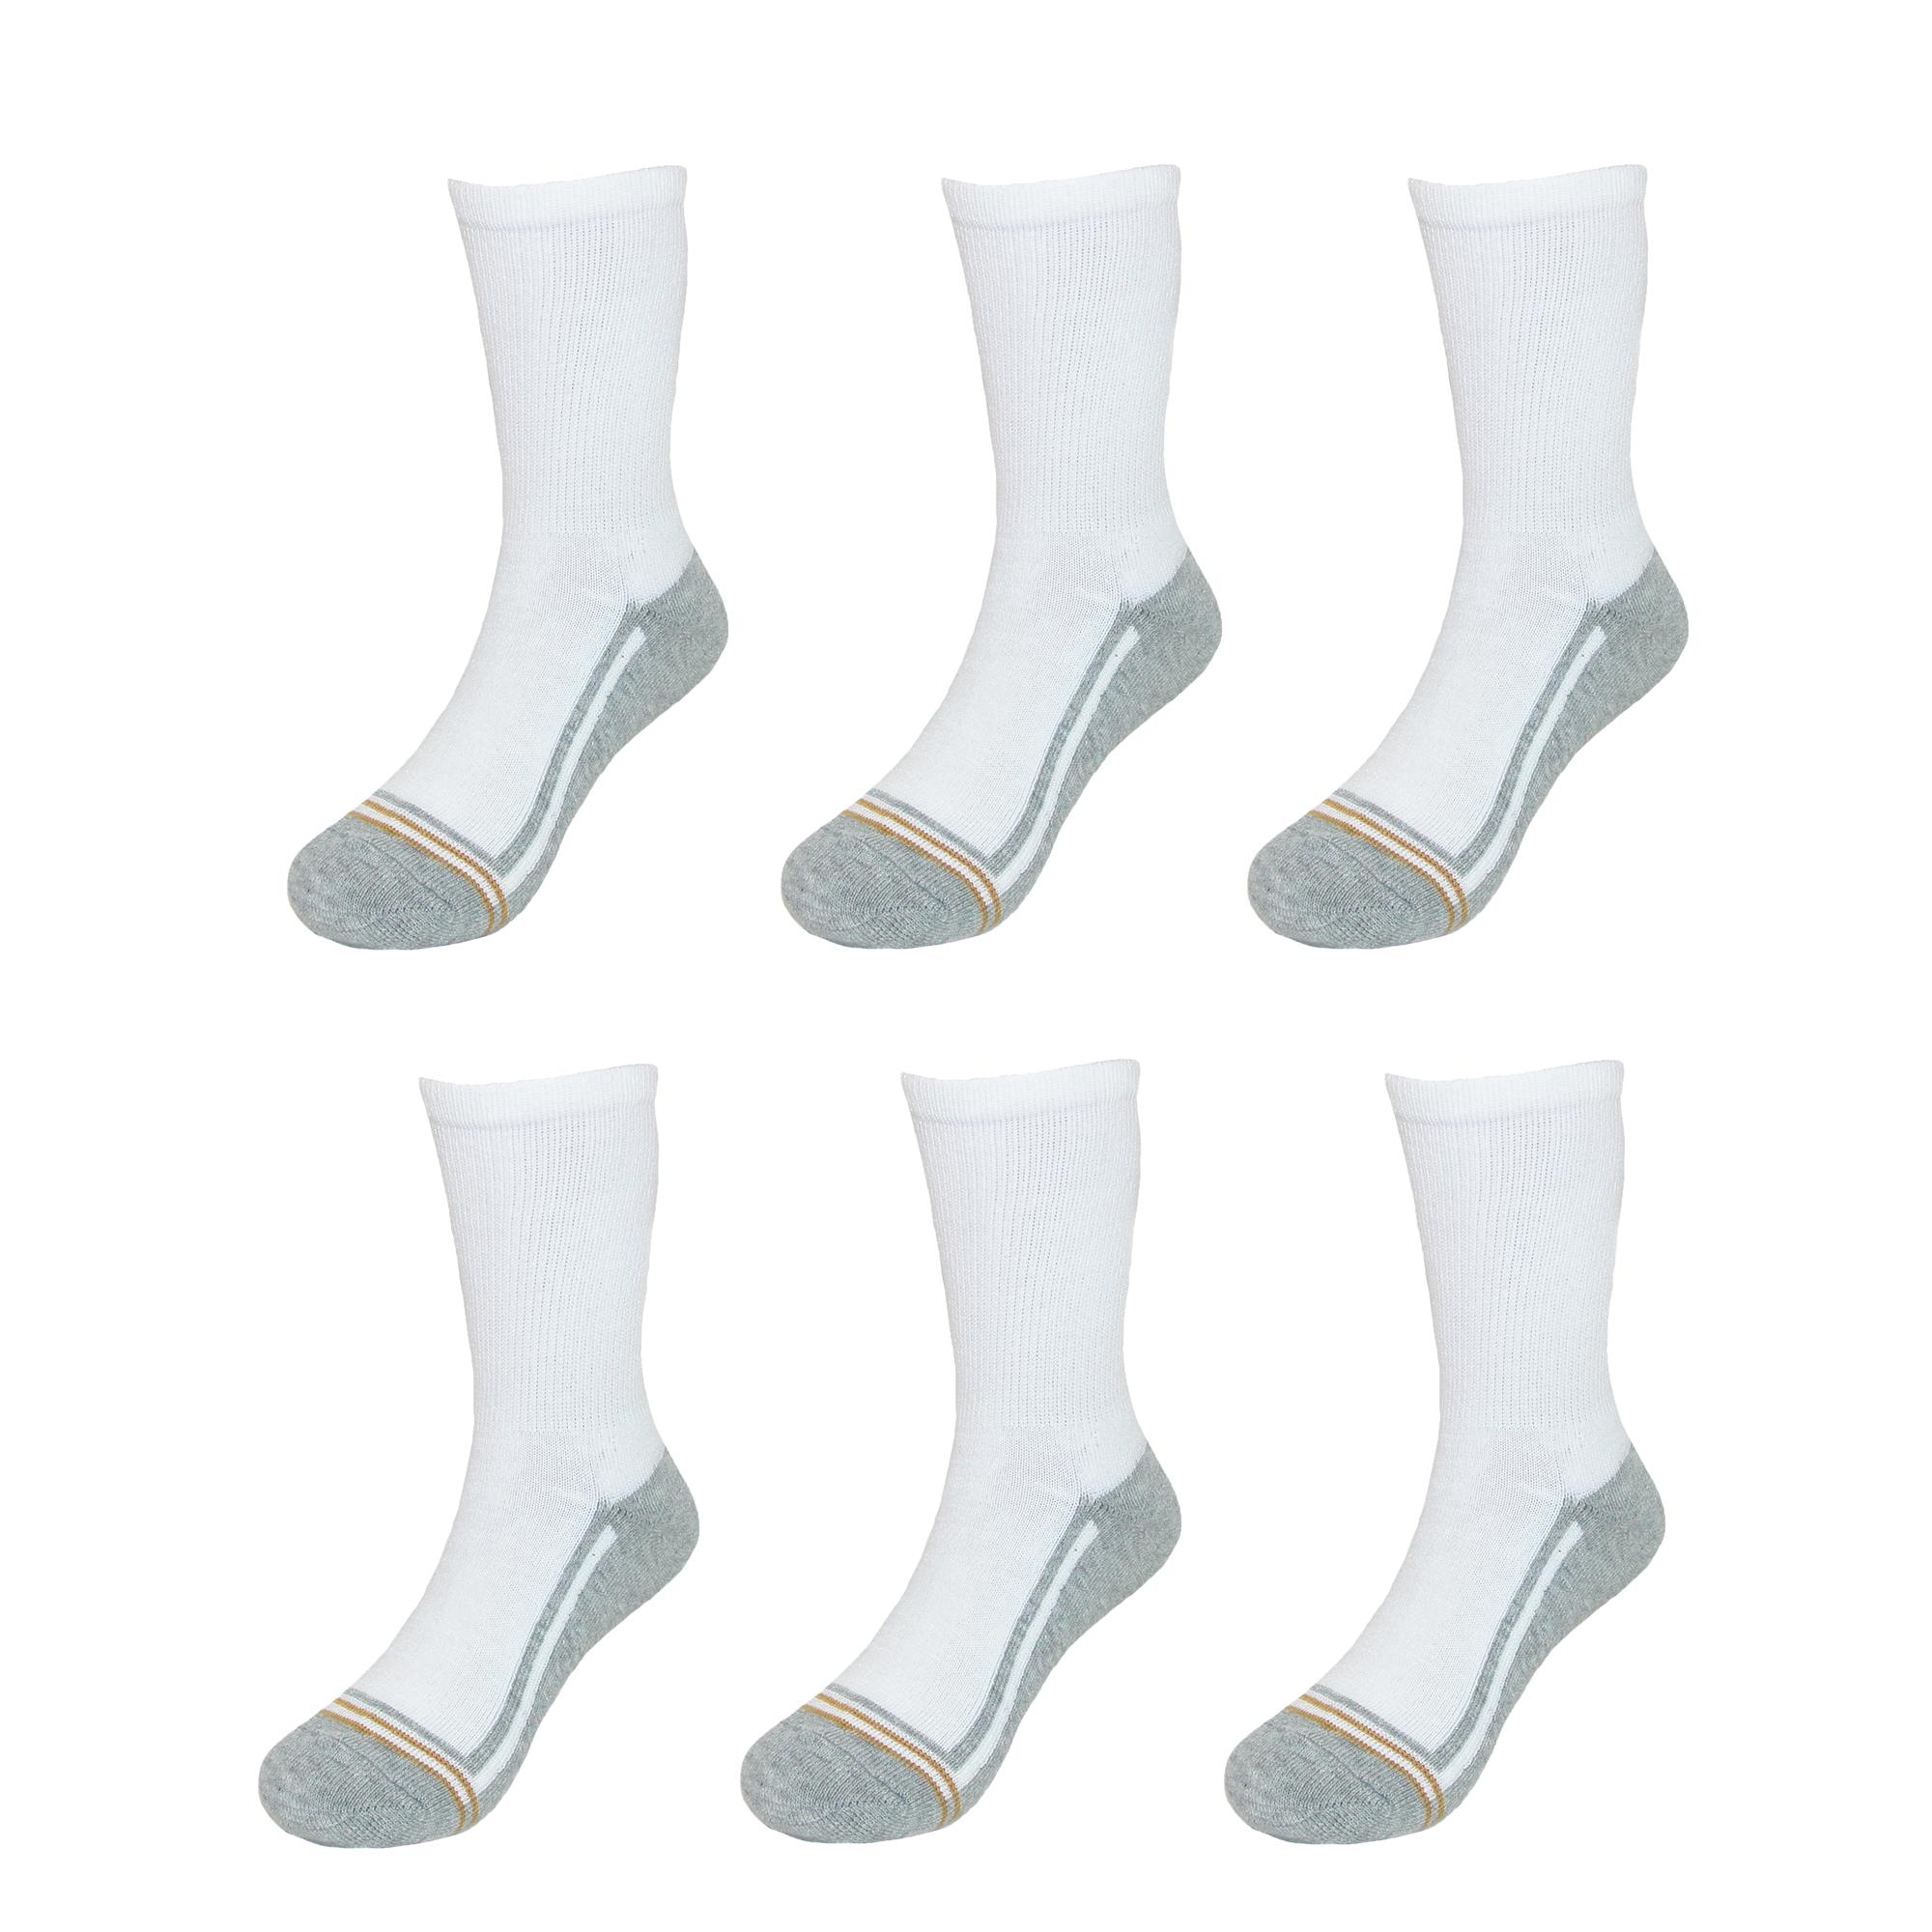 Pack of 6 New Gold Toe Boys/' Athletic Crew Socks